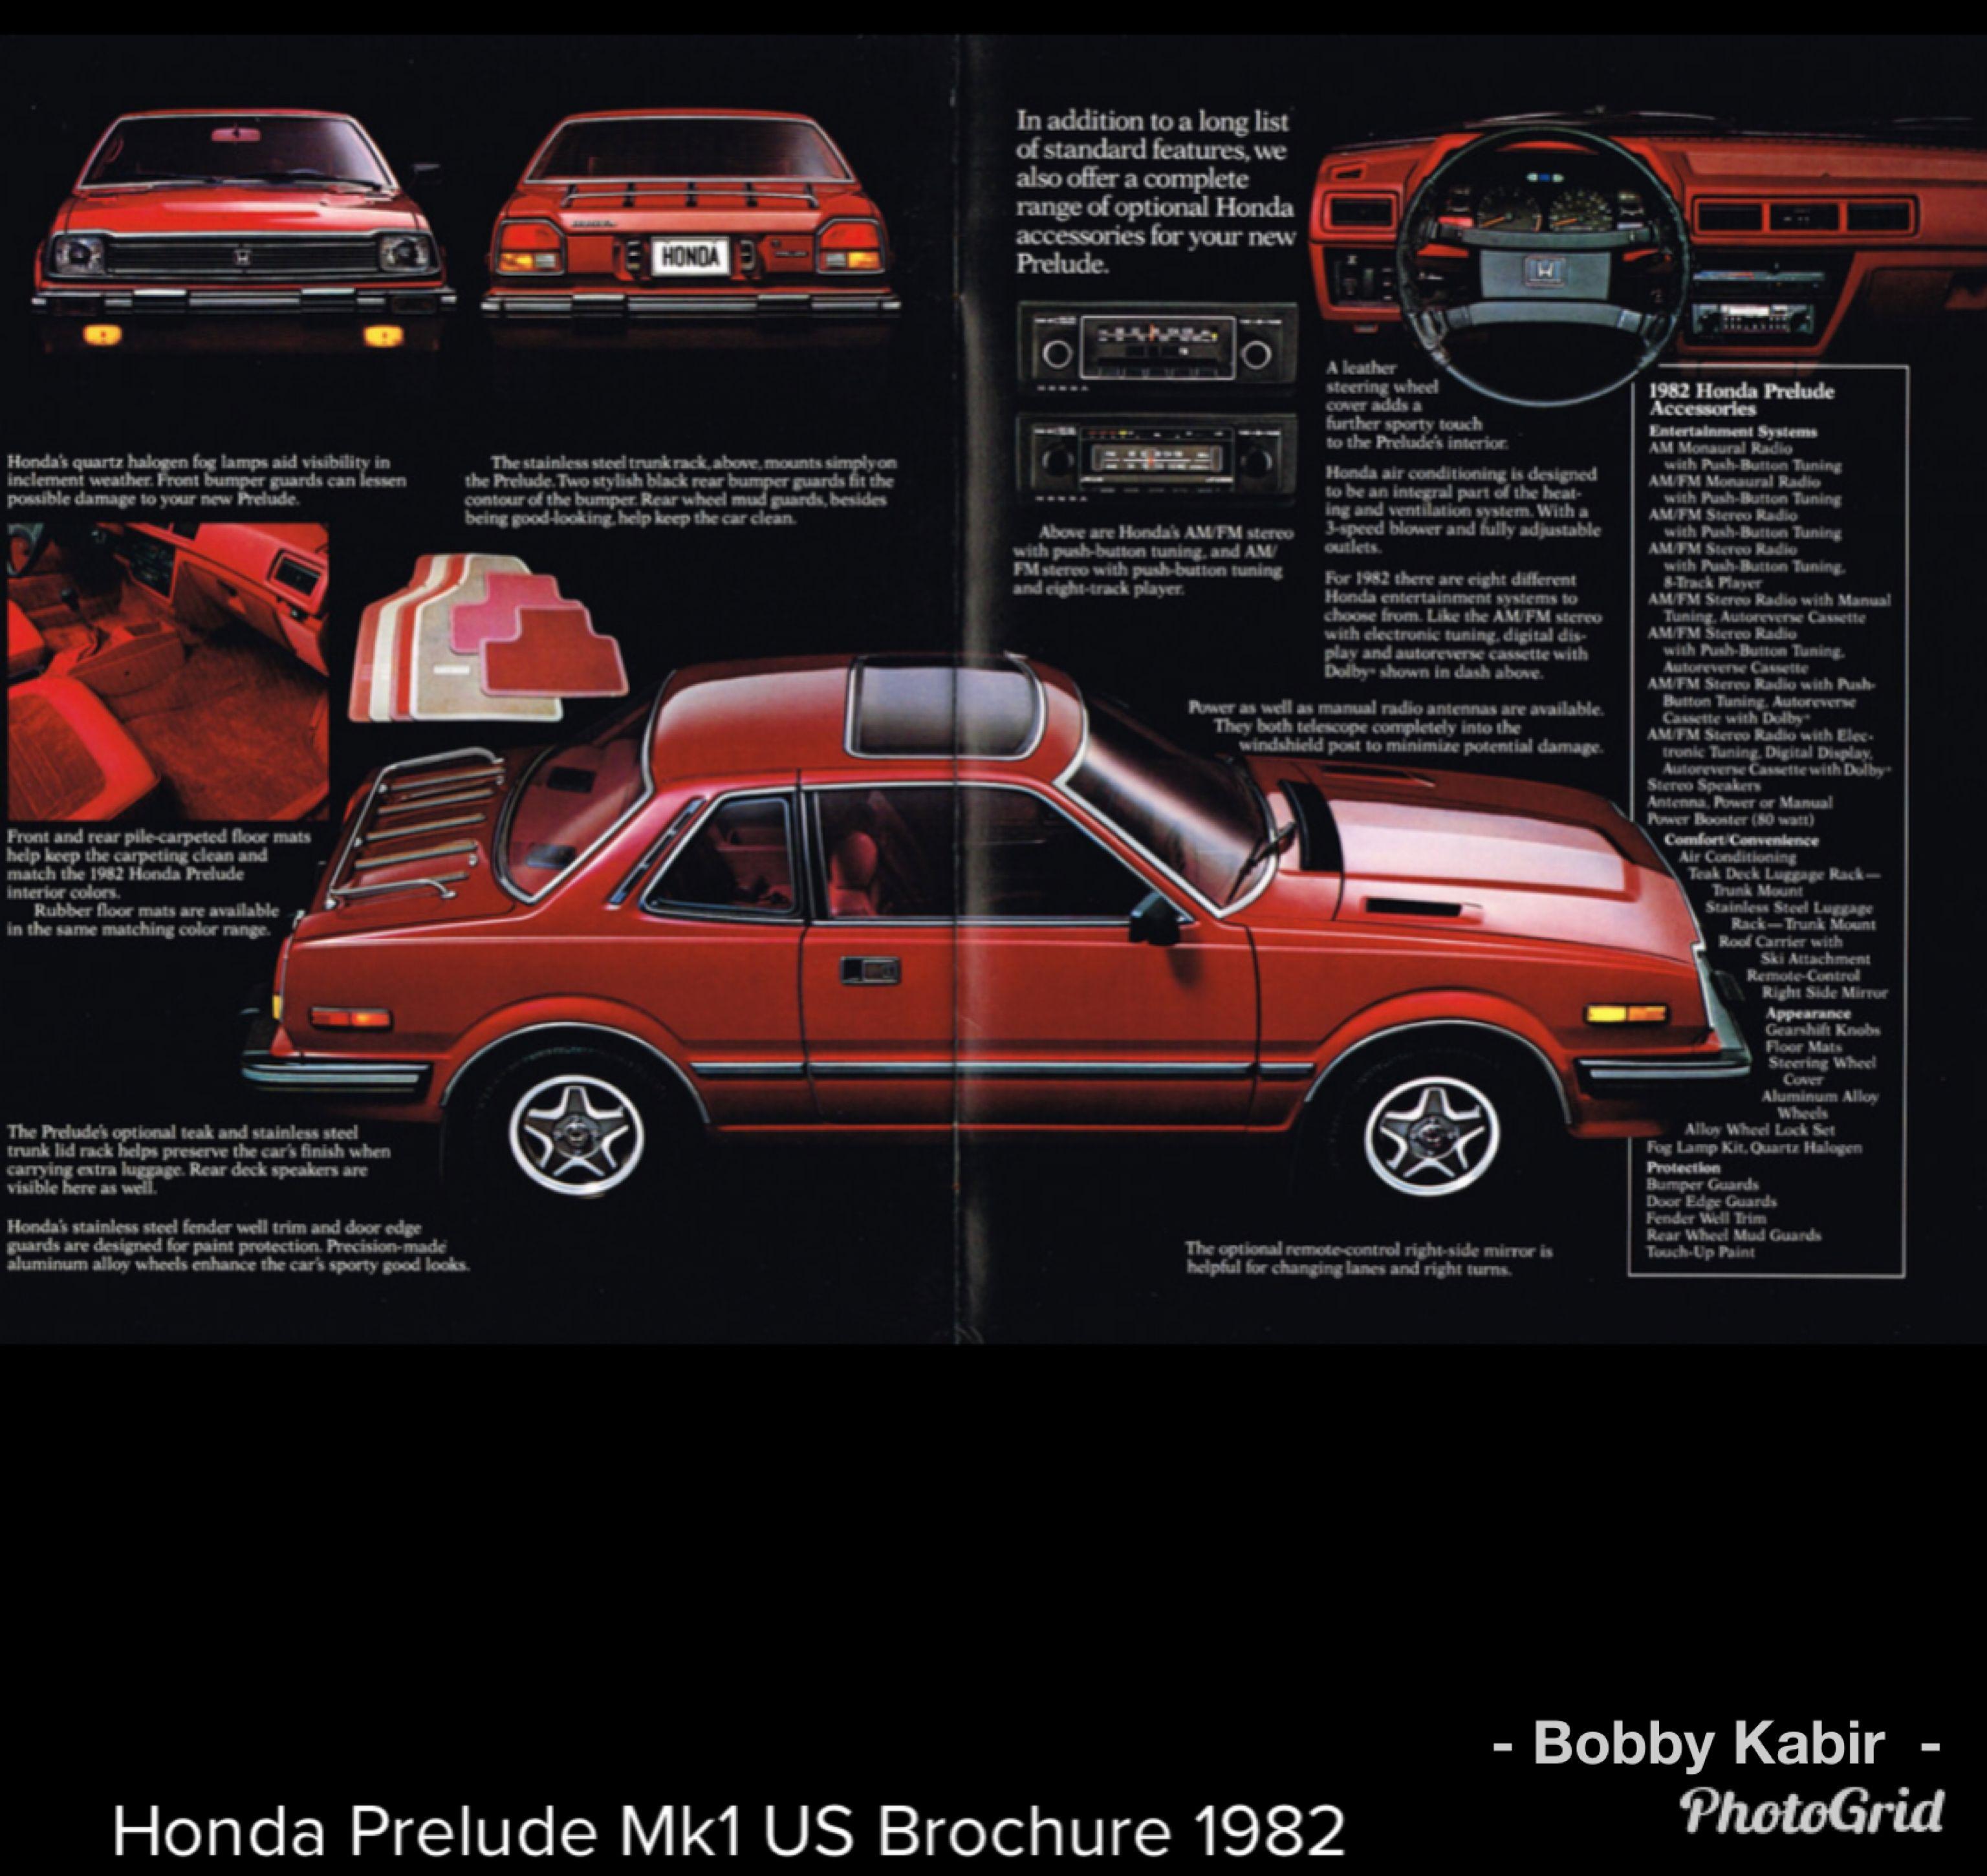 1982 Honda Prelude (Mk 1) USA by Honda Brochures on